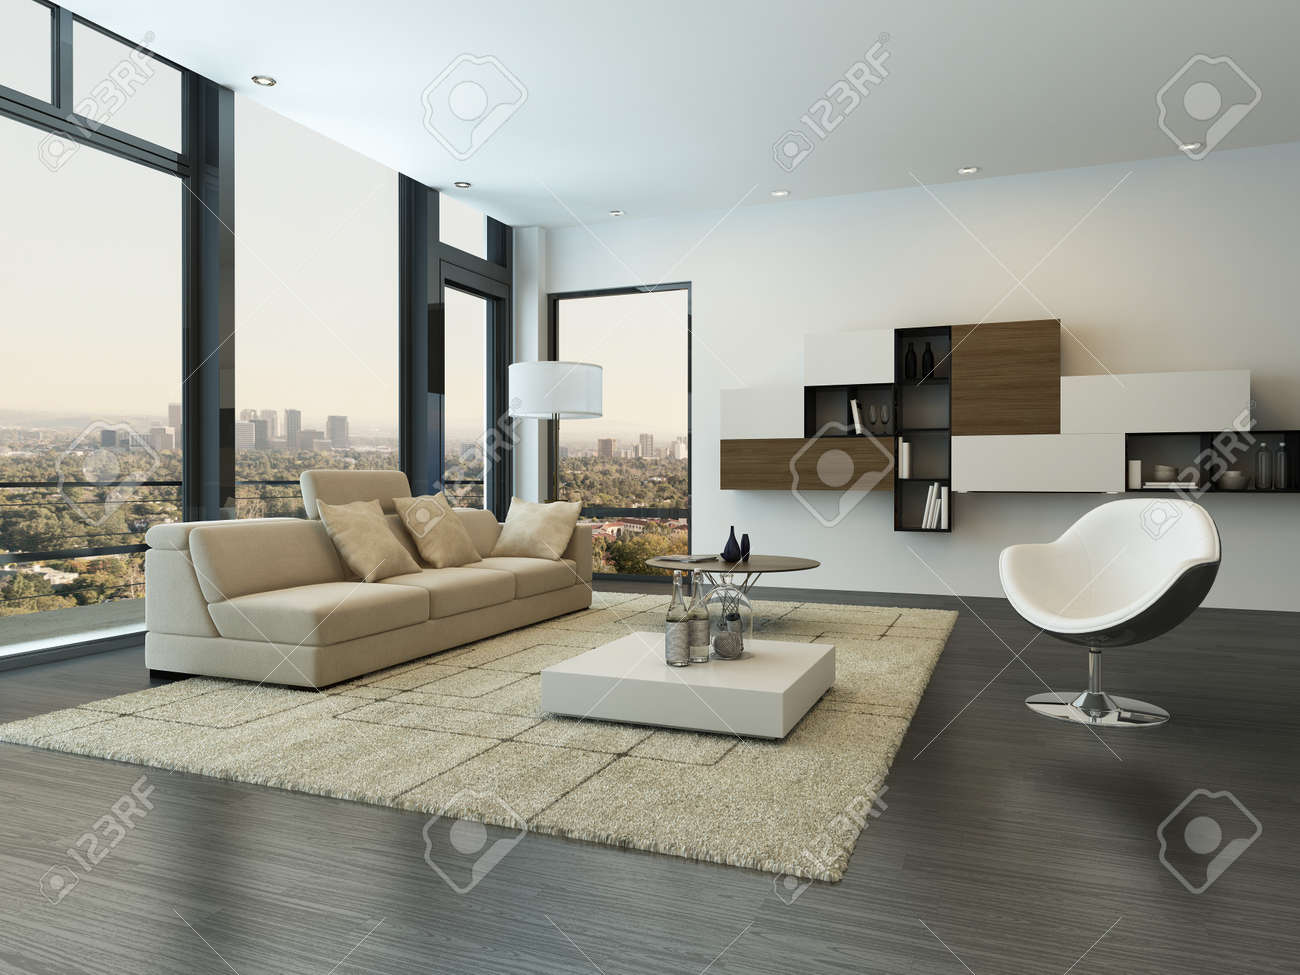 Moderne woonkamer interieur met design meubels royalty vrije foto ...